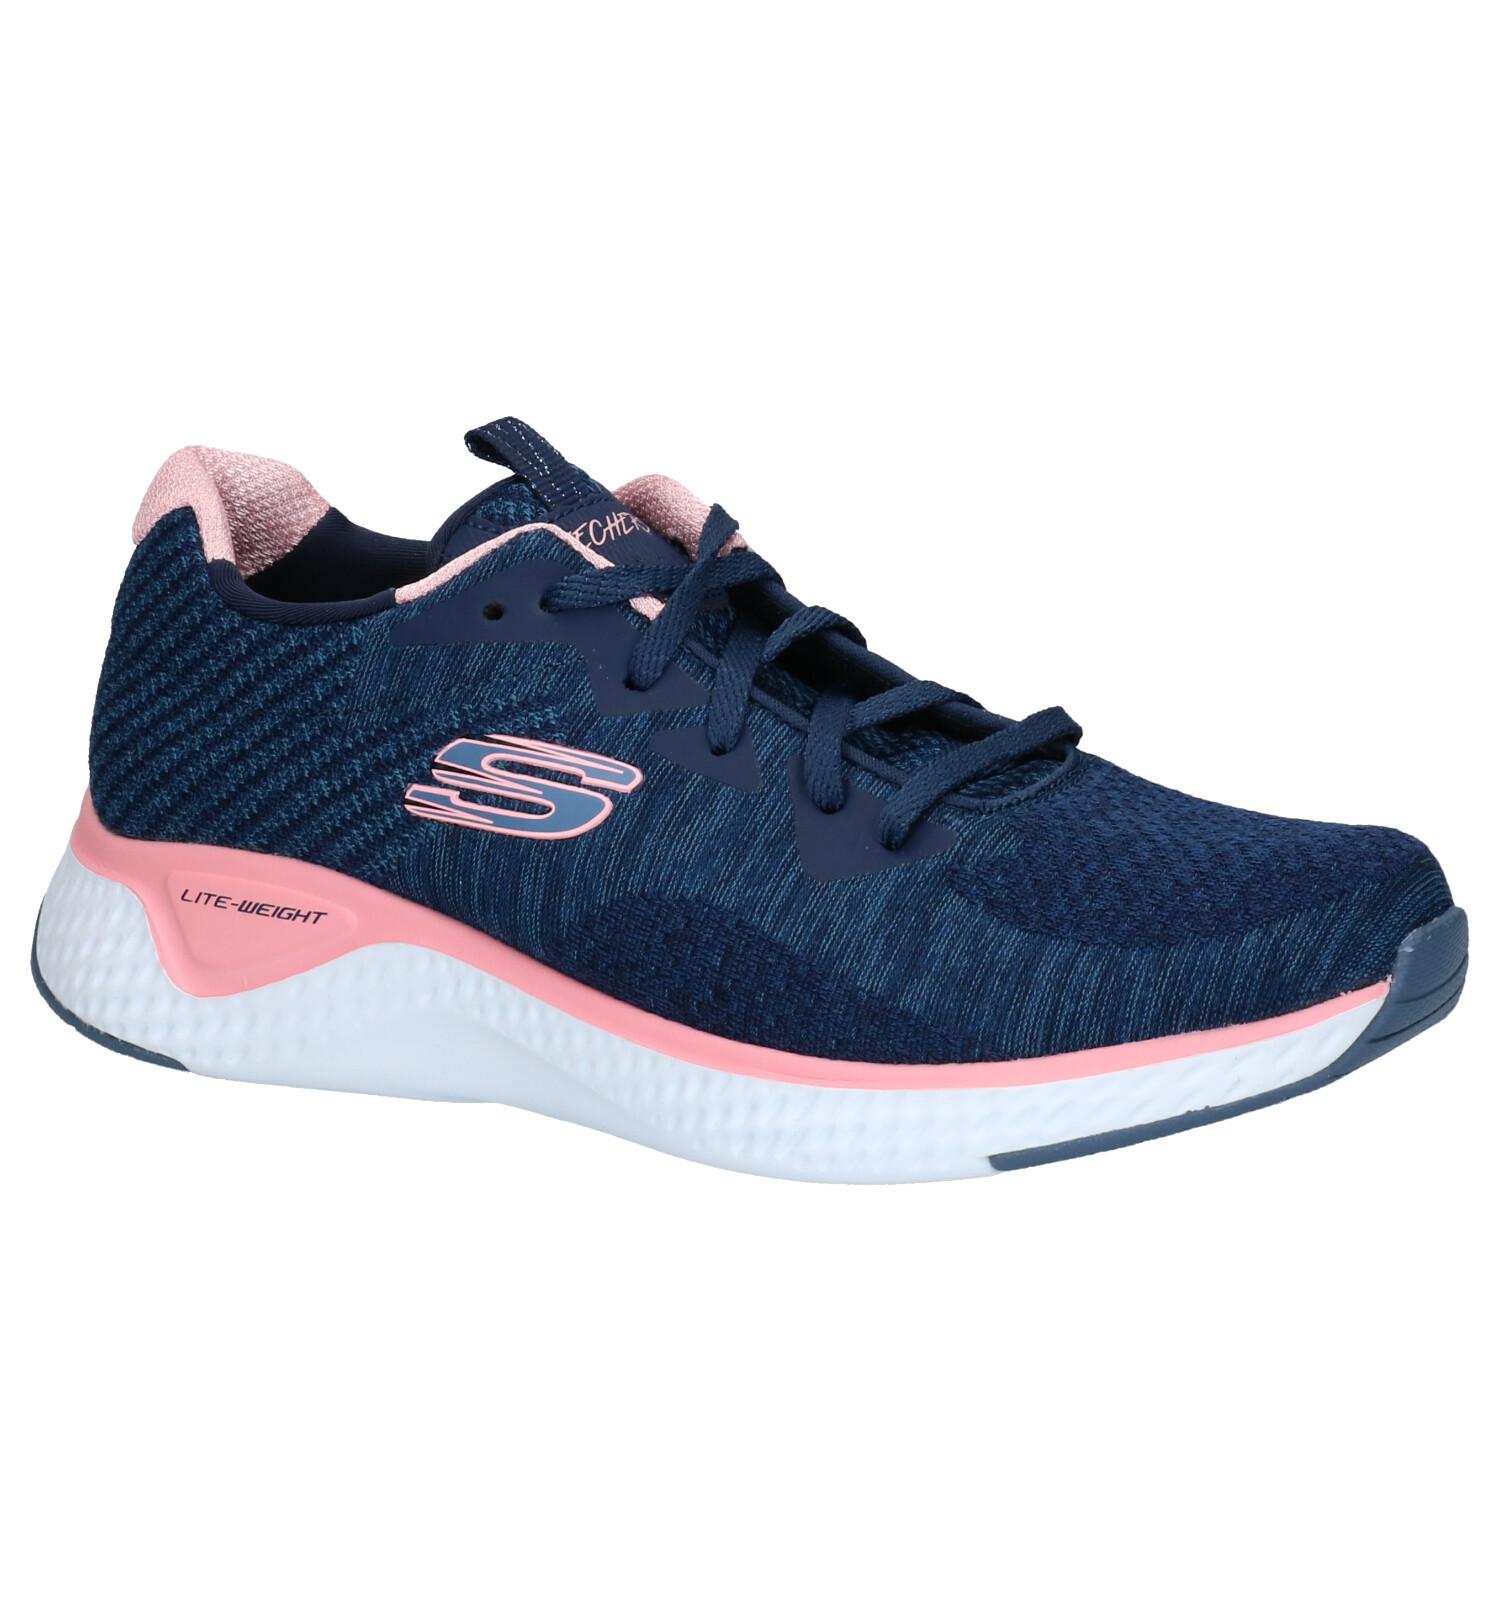 Skechers Solar Fuse Blauwe Sneakers   TORFS.BE   Gratis verzend en retour